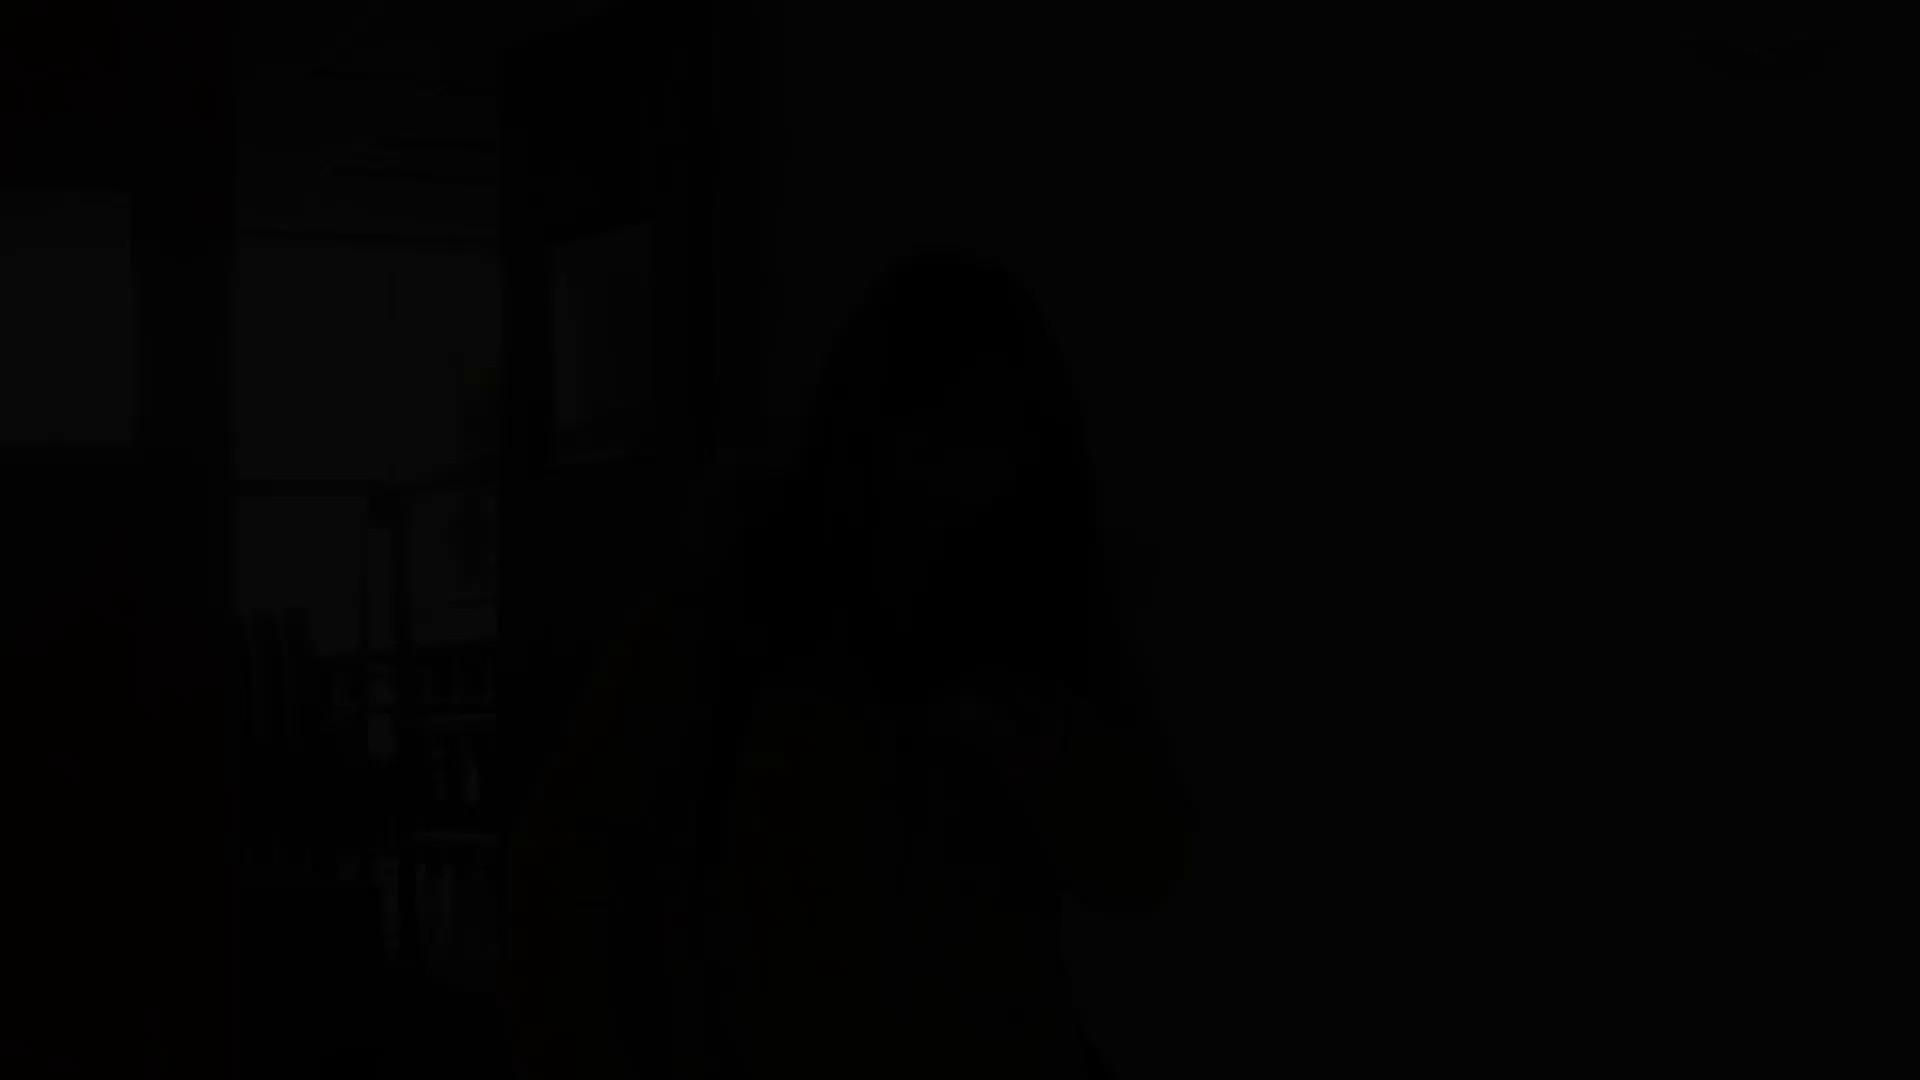 JD盗撮 美女の洗面所の秘密 Vol.61 美女 ぱこり動画紹介 108画像 88